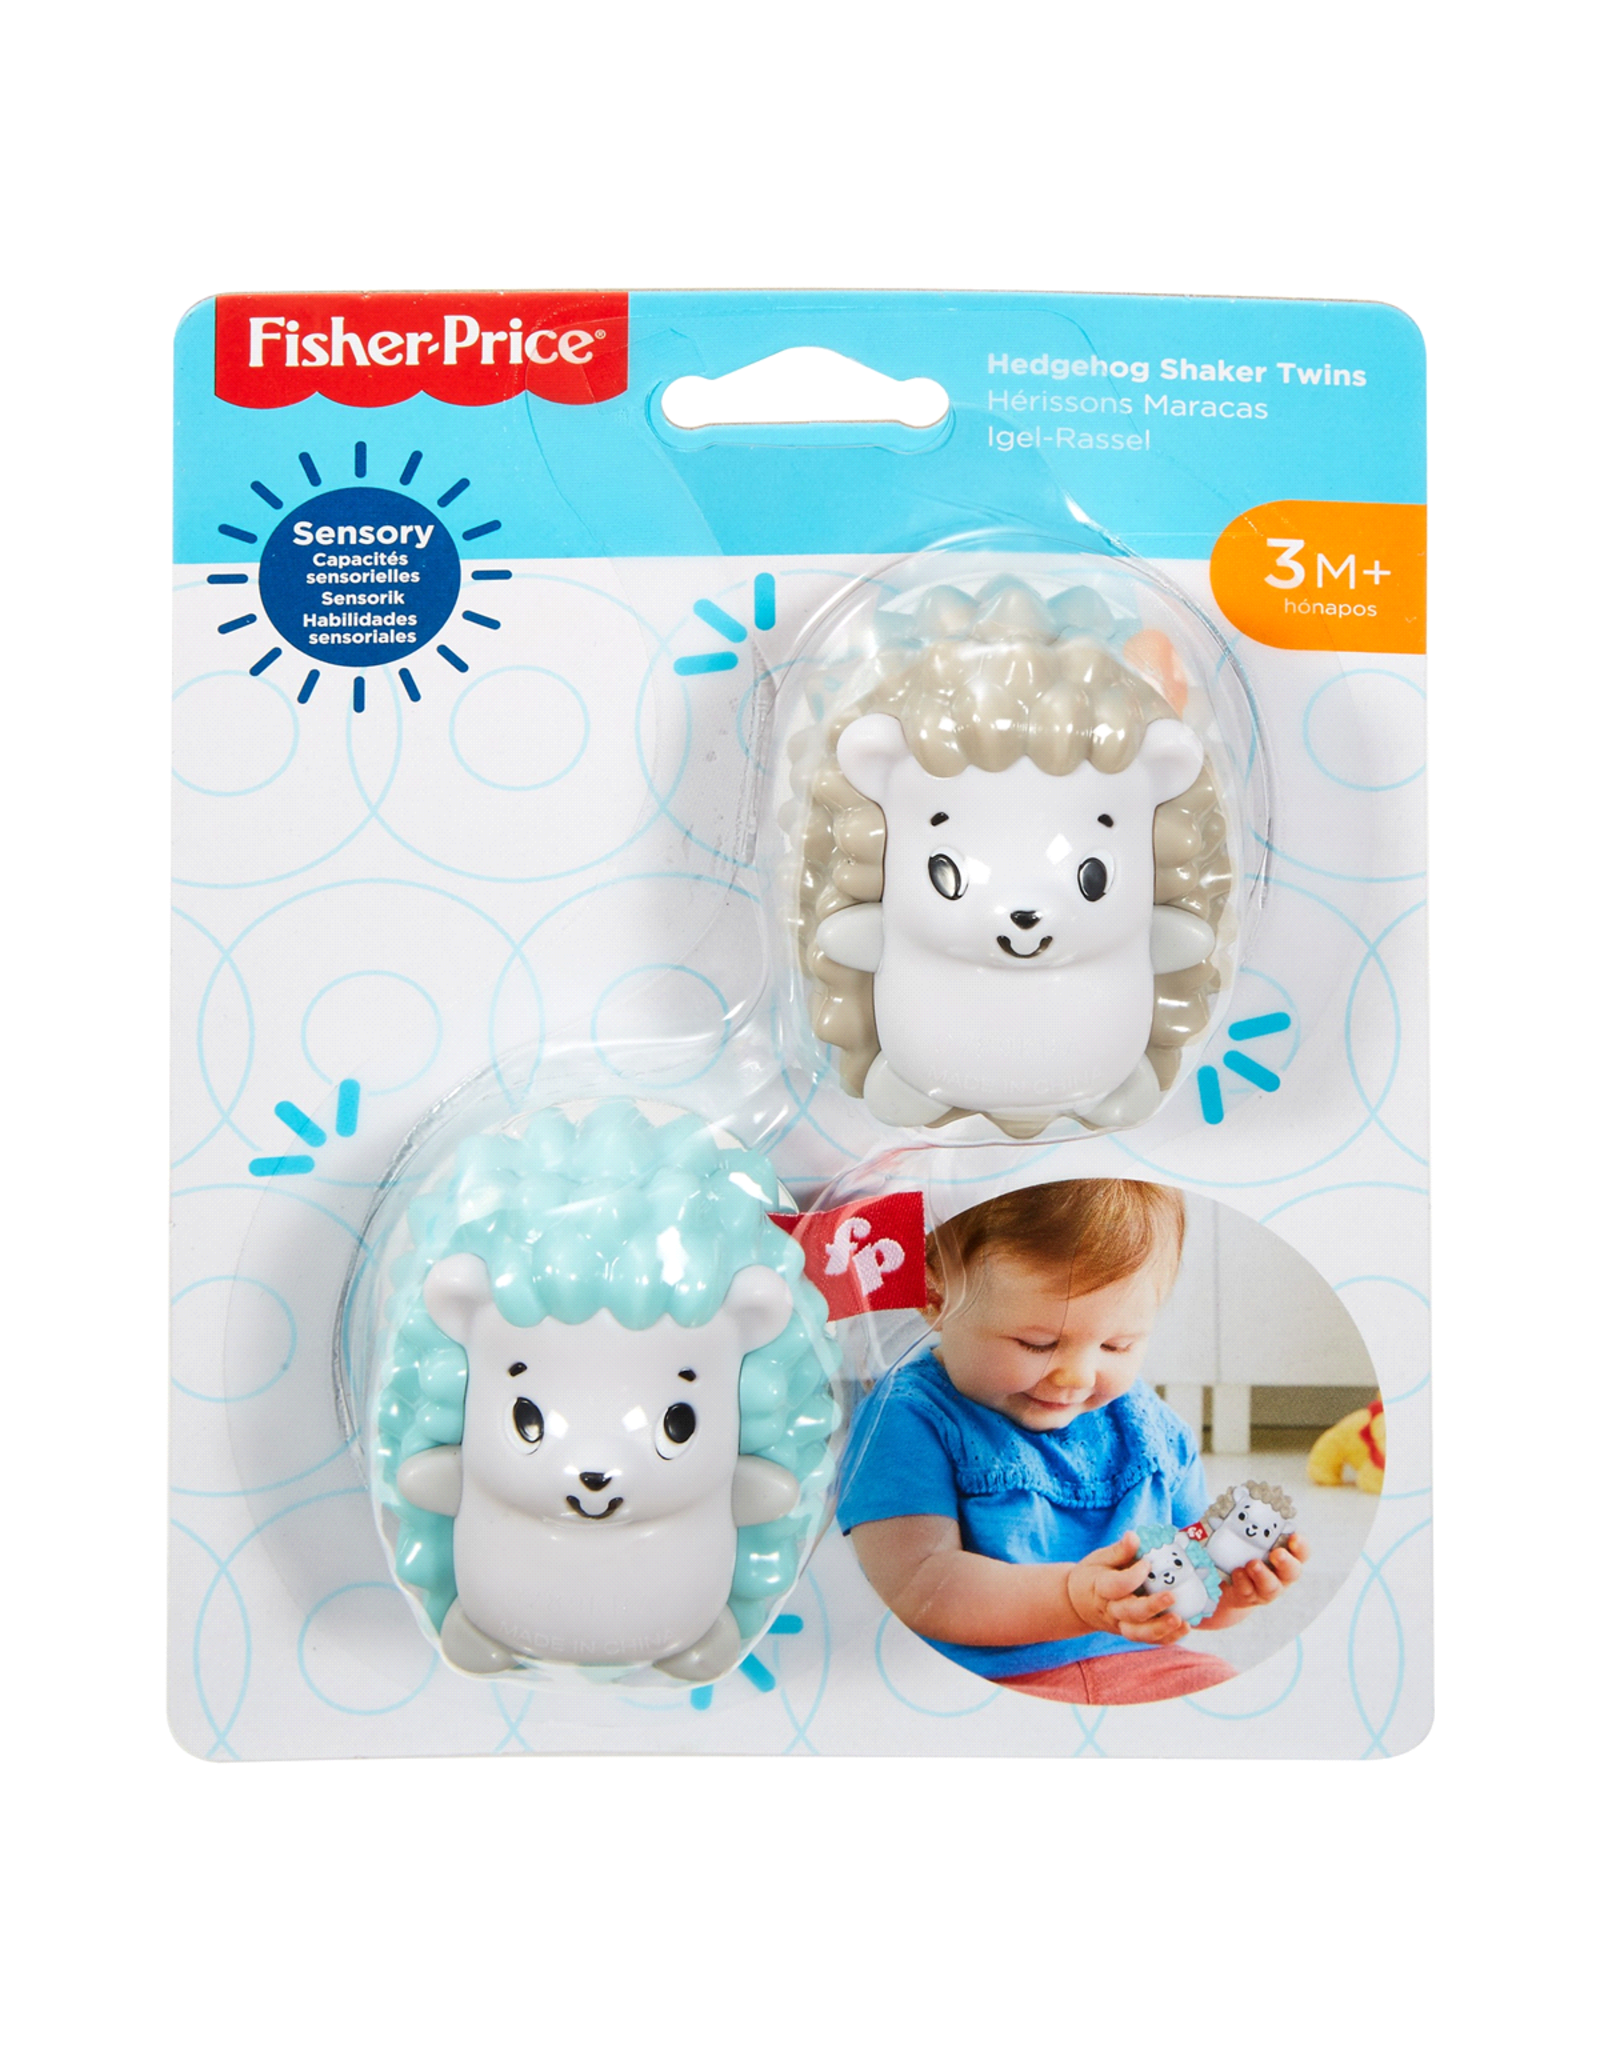 Fisher Price Fisher Price Hedgehog Shaker Twins